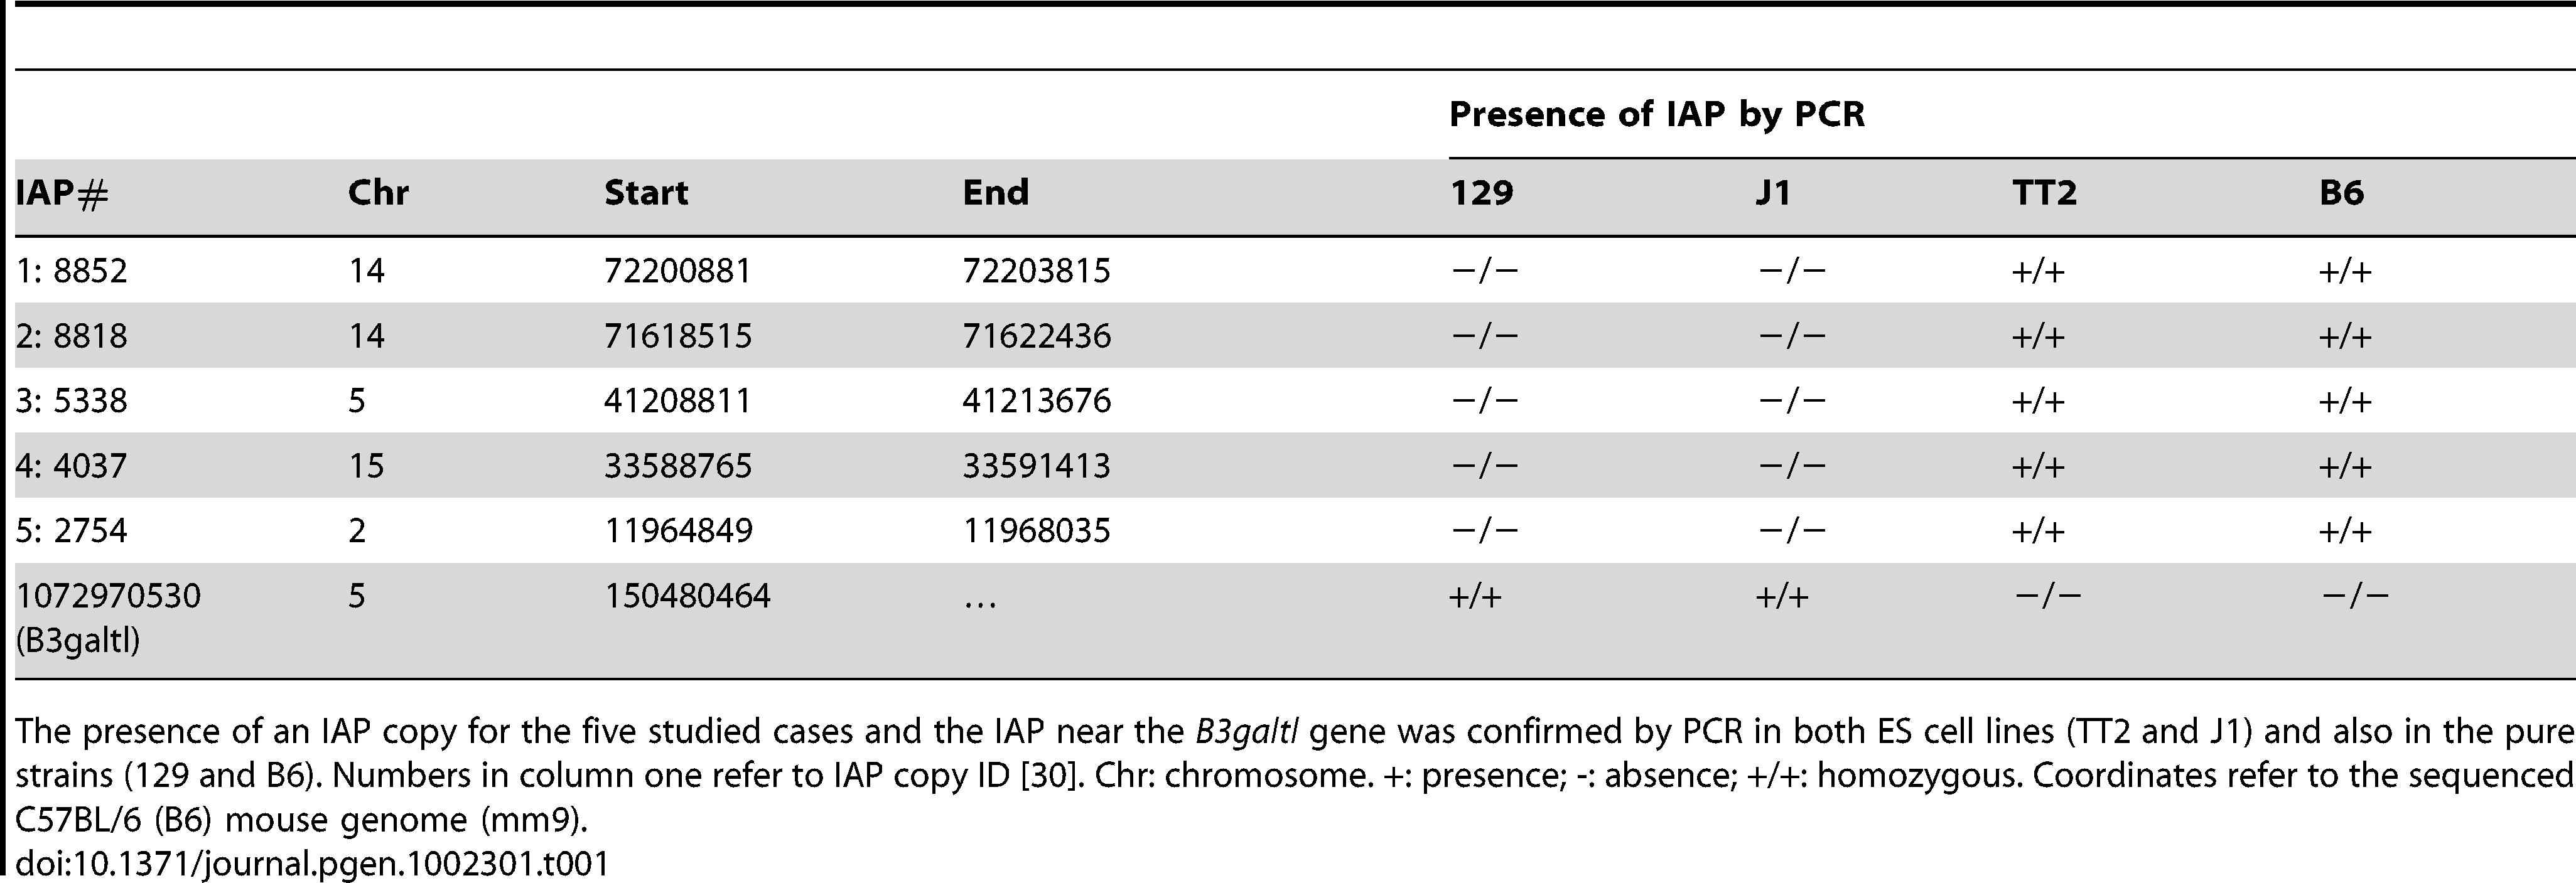 Confirmation of IAP presence.